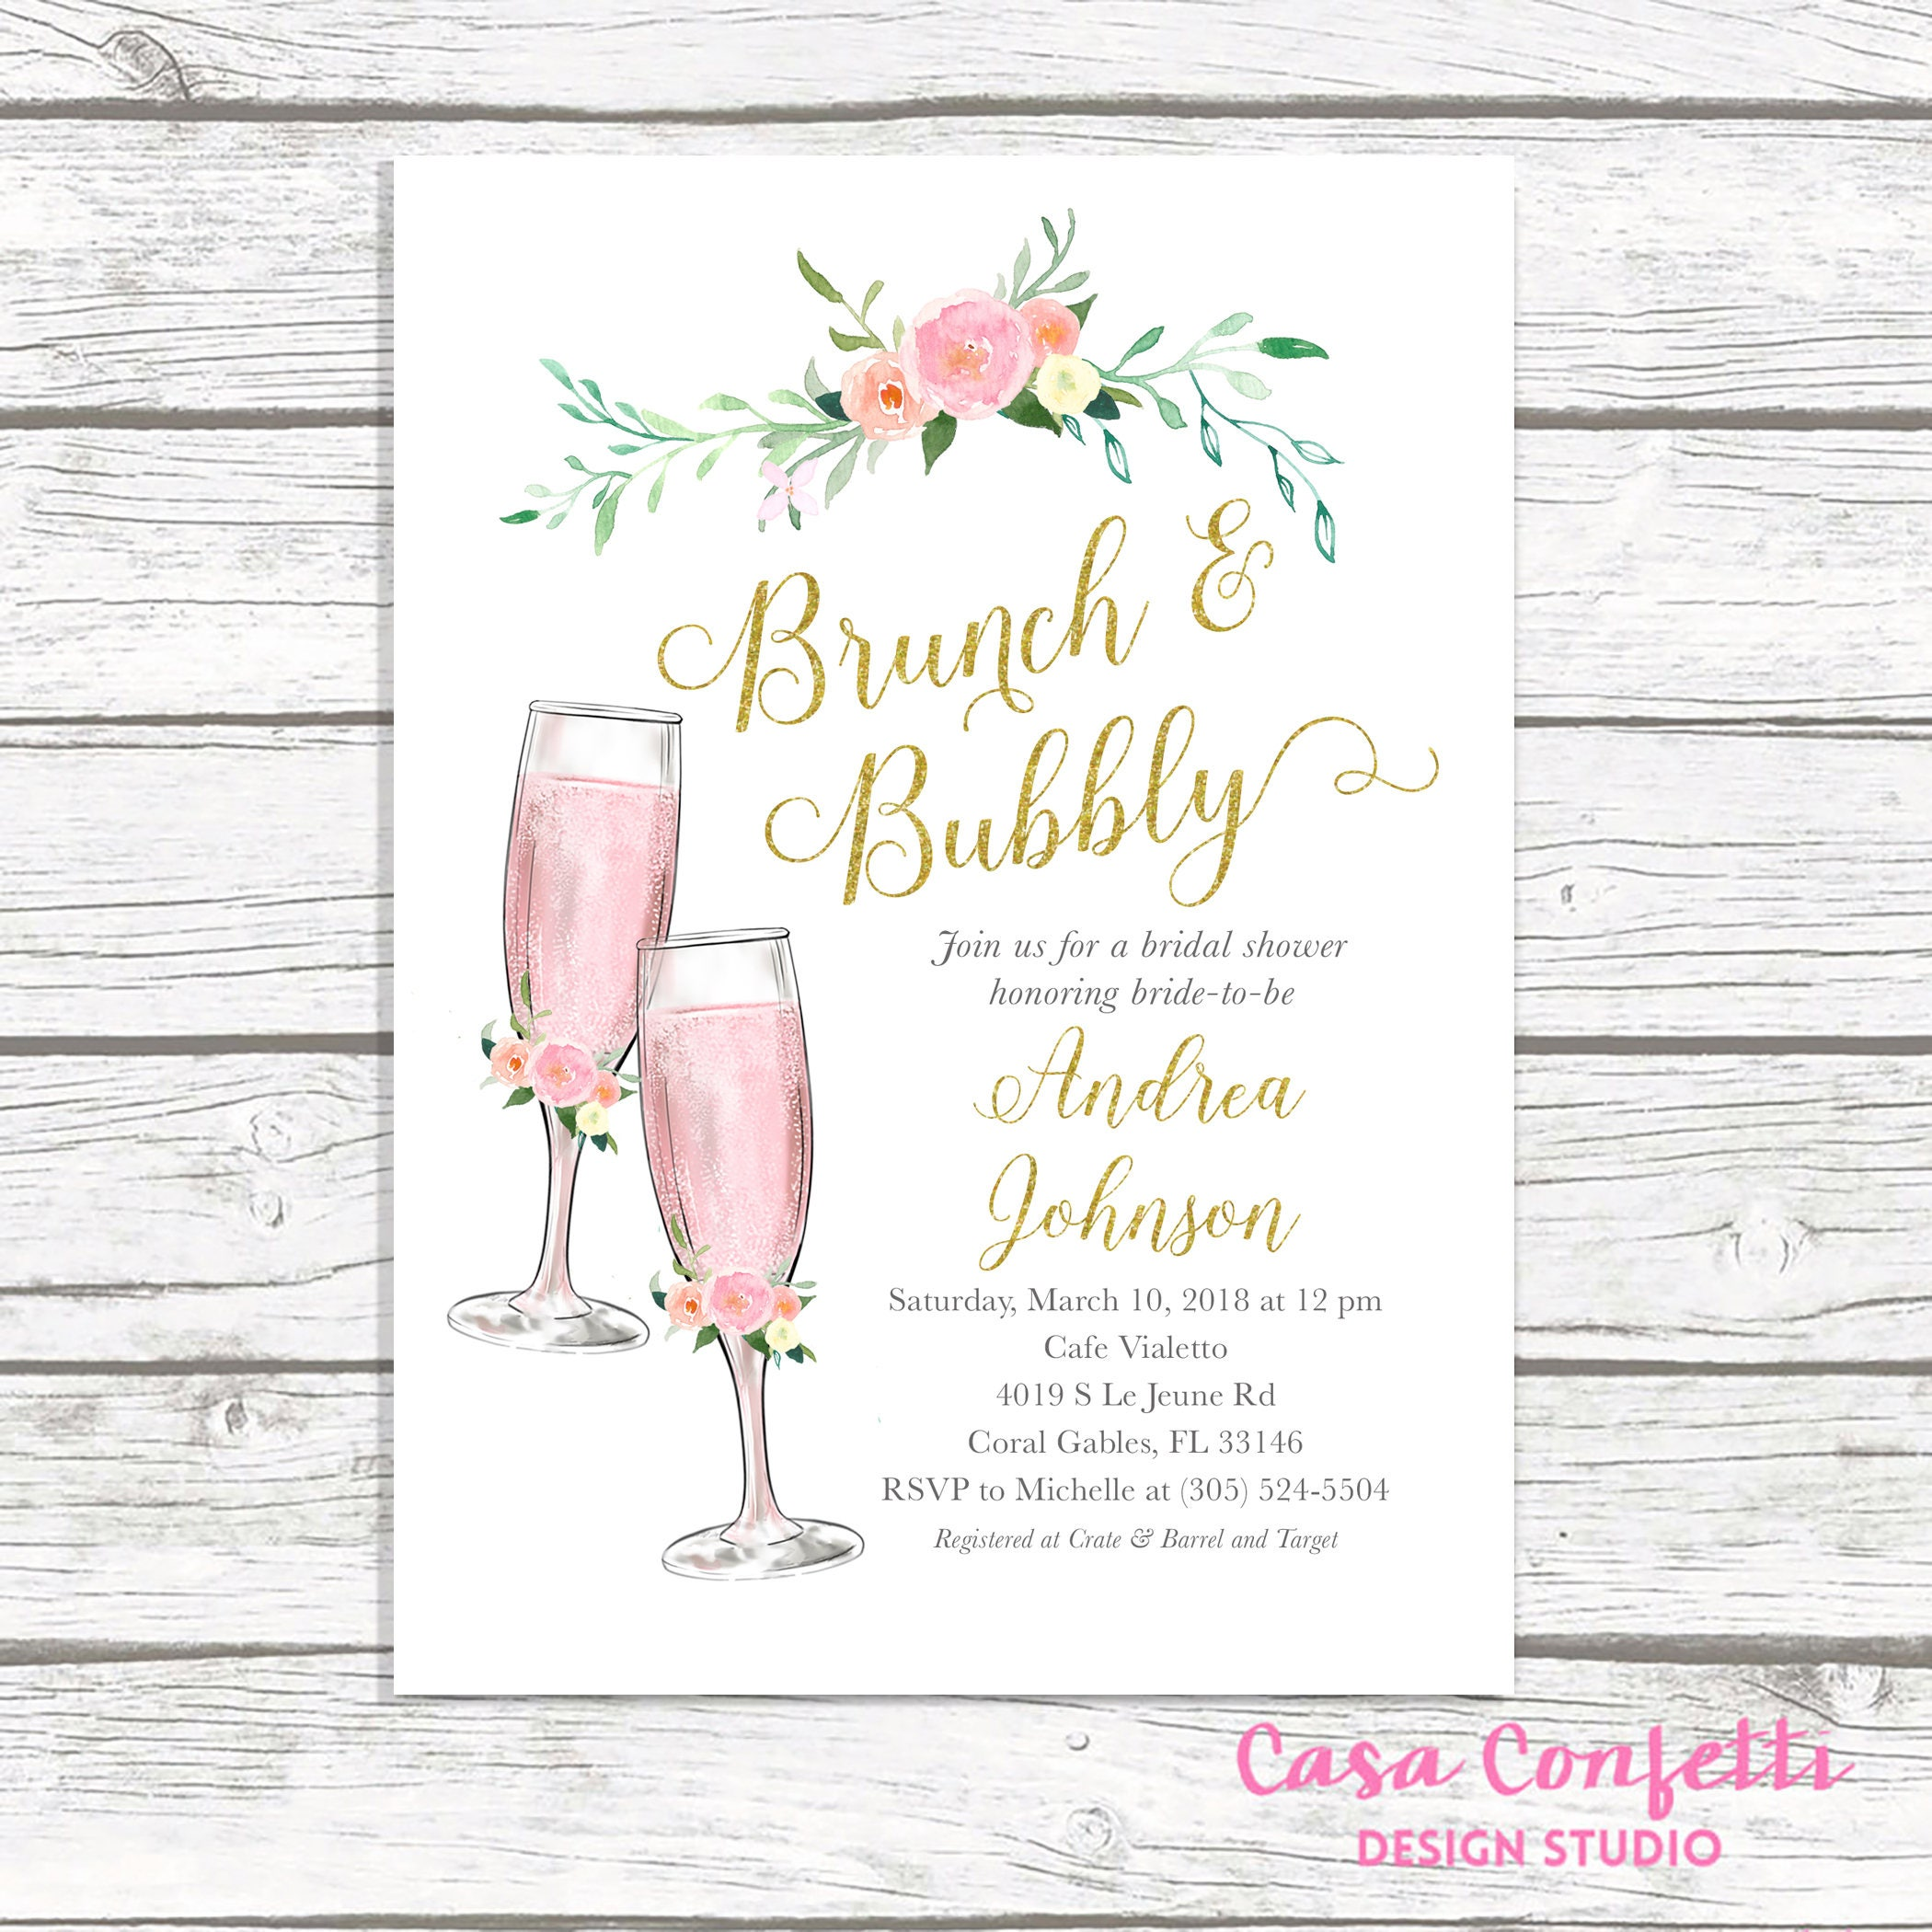 Brunch and Bubbly Bridal Shower Invitation, Brunch & Bubbly ...